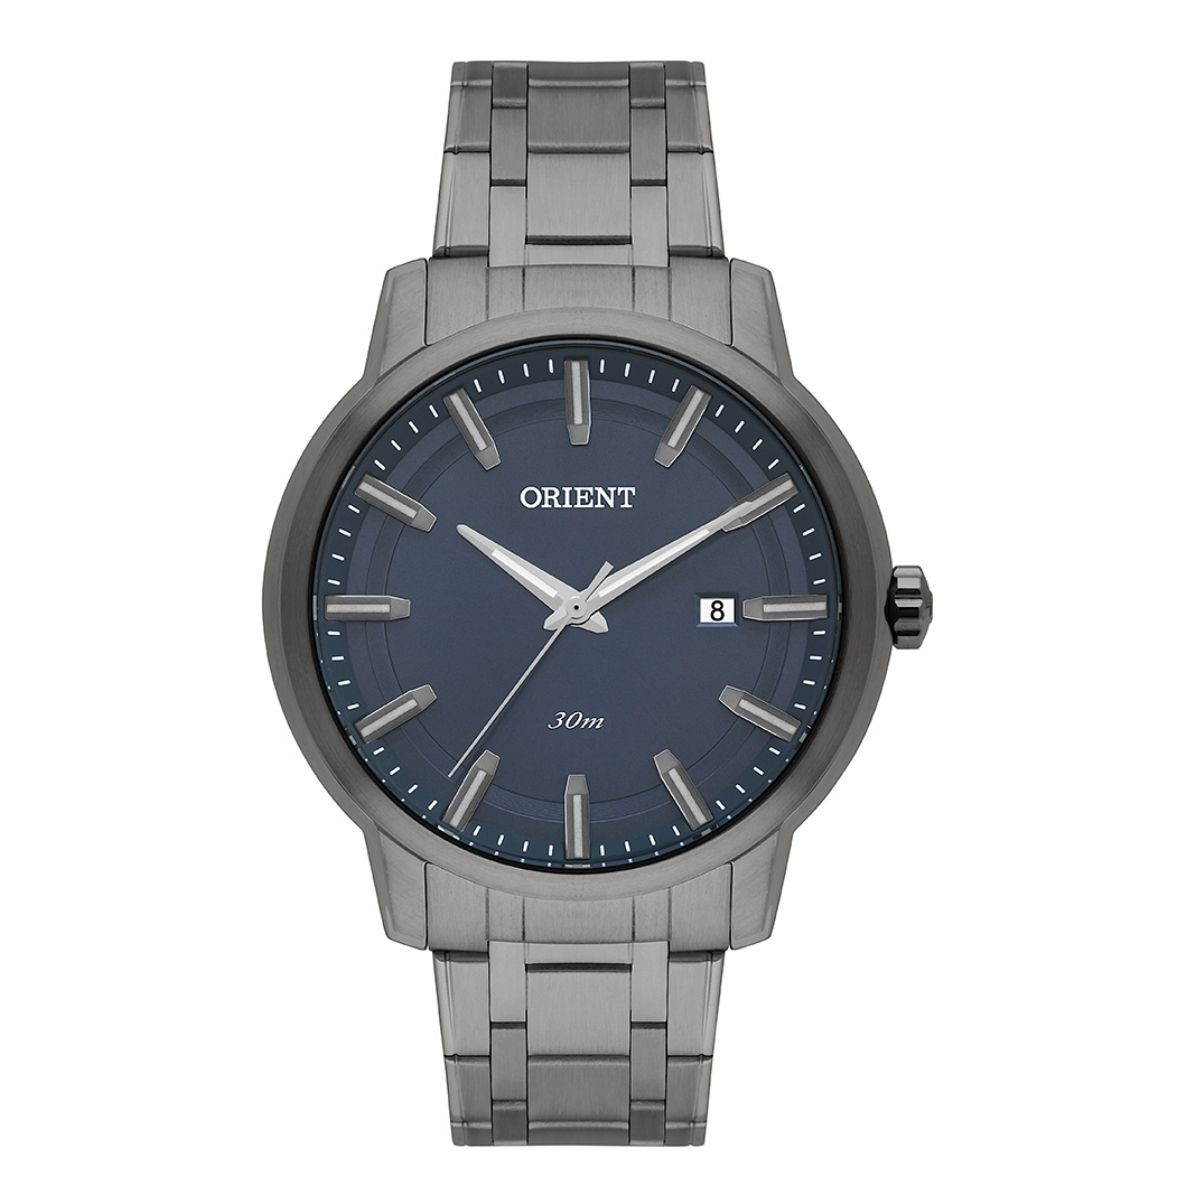 Relógio Masculino Orient  Chumbo